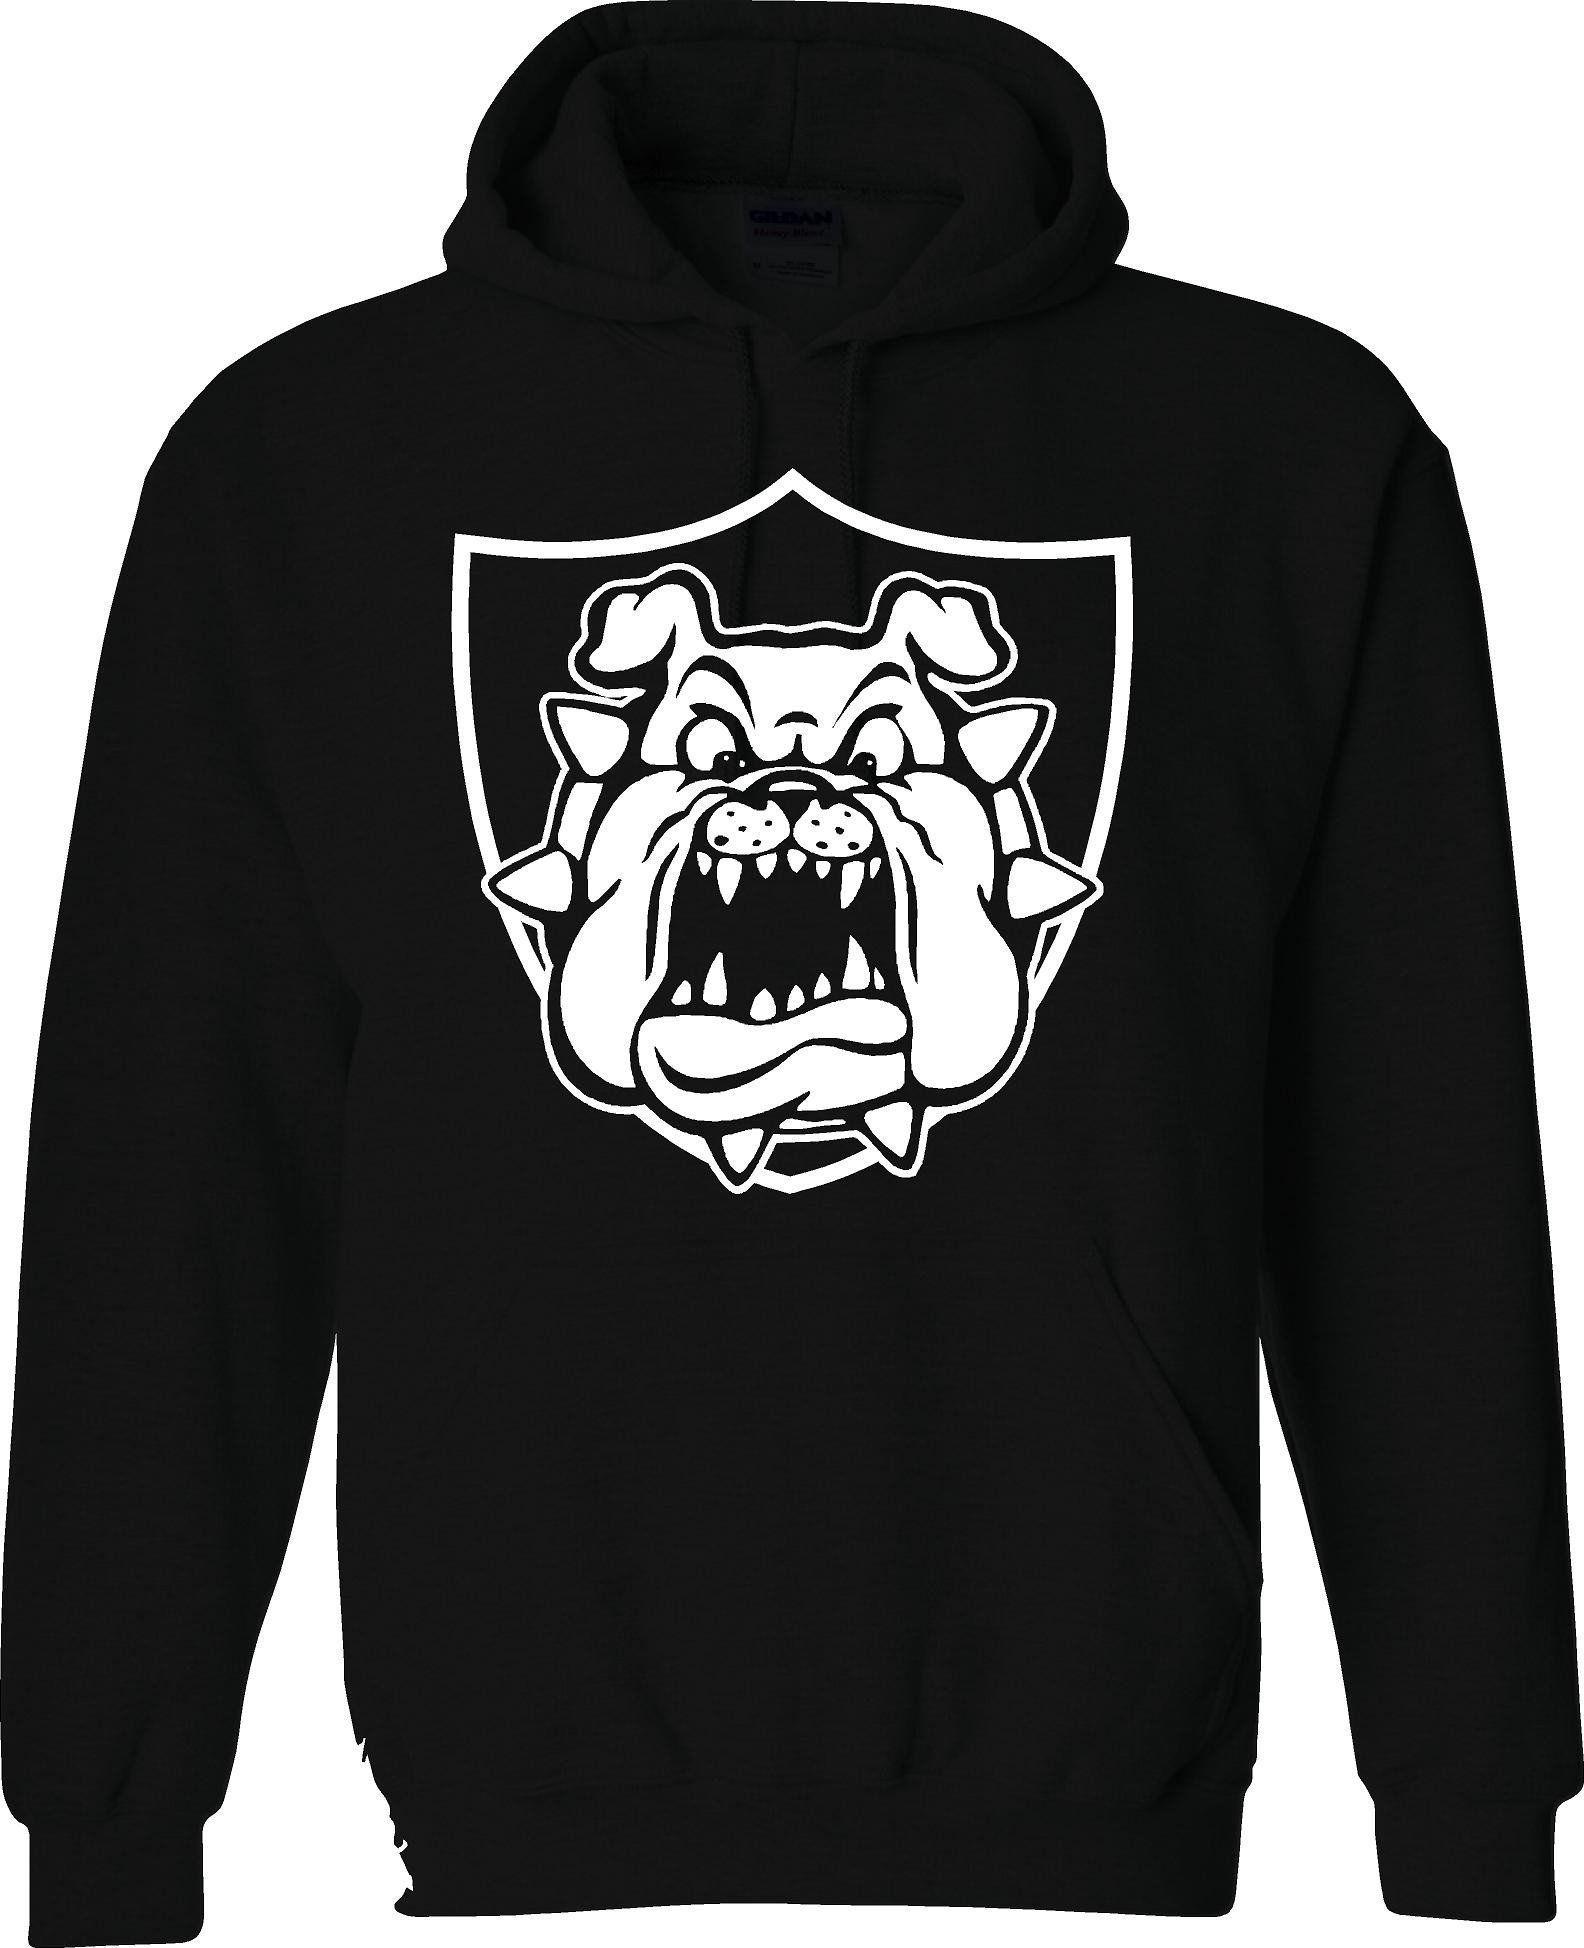 super popular 0b893 2563d Derek Carr Raider Bulldog - Raiders 4 Life Pullover Hoodie ...